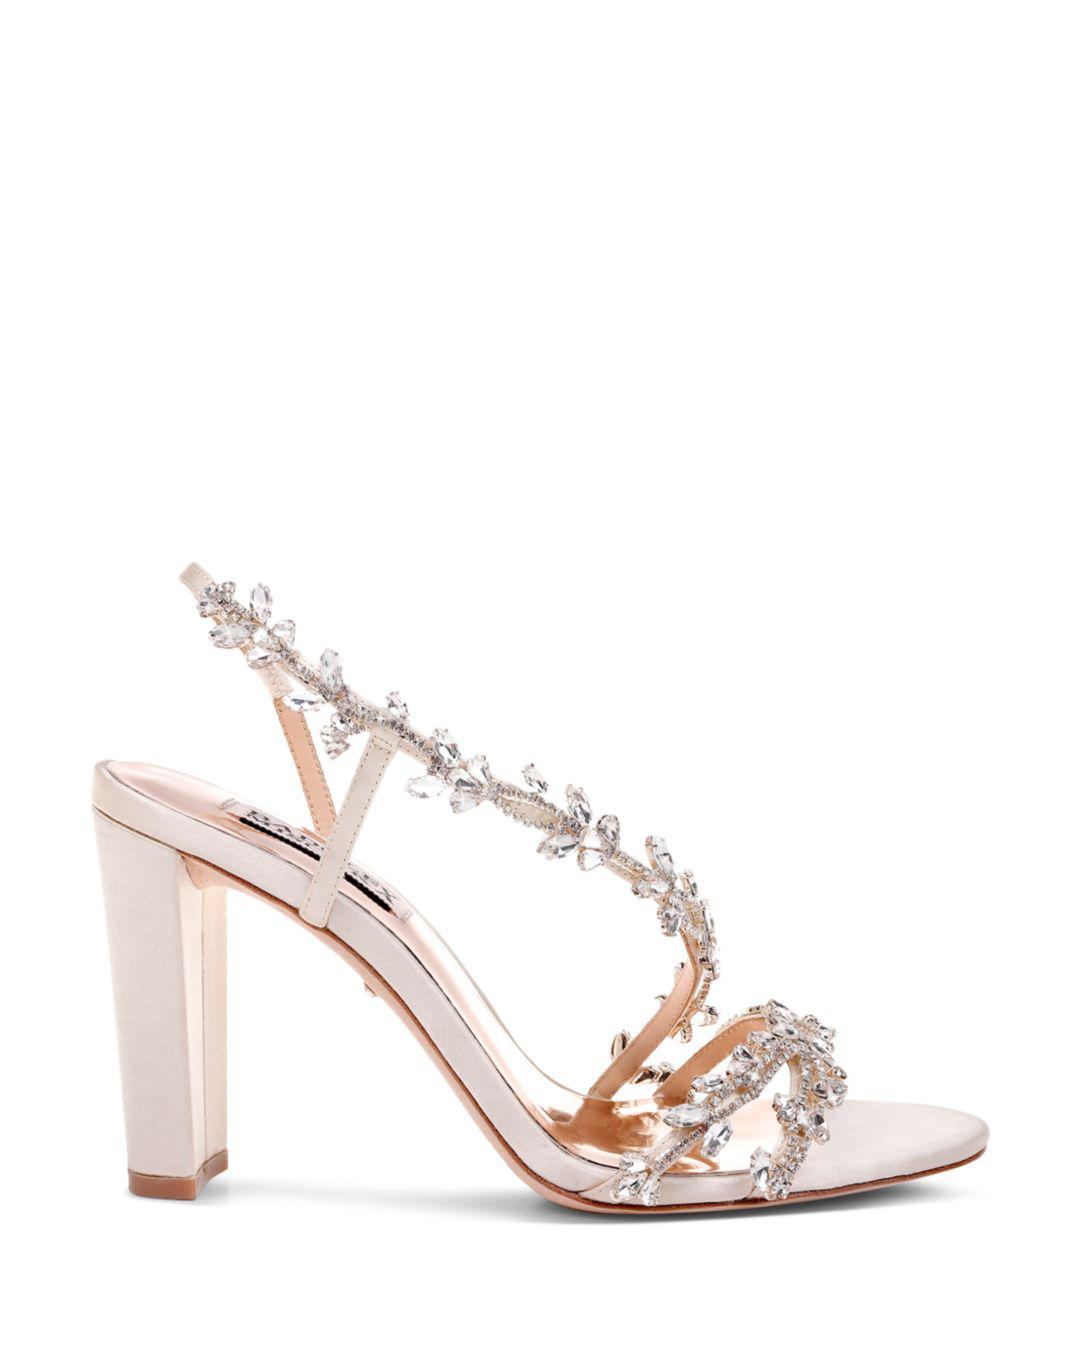 3f55d2085 Lyst - Badgley Mischka Women s Felda Crystal Embellished High-heel Sandals  in White